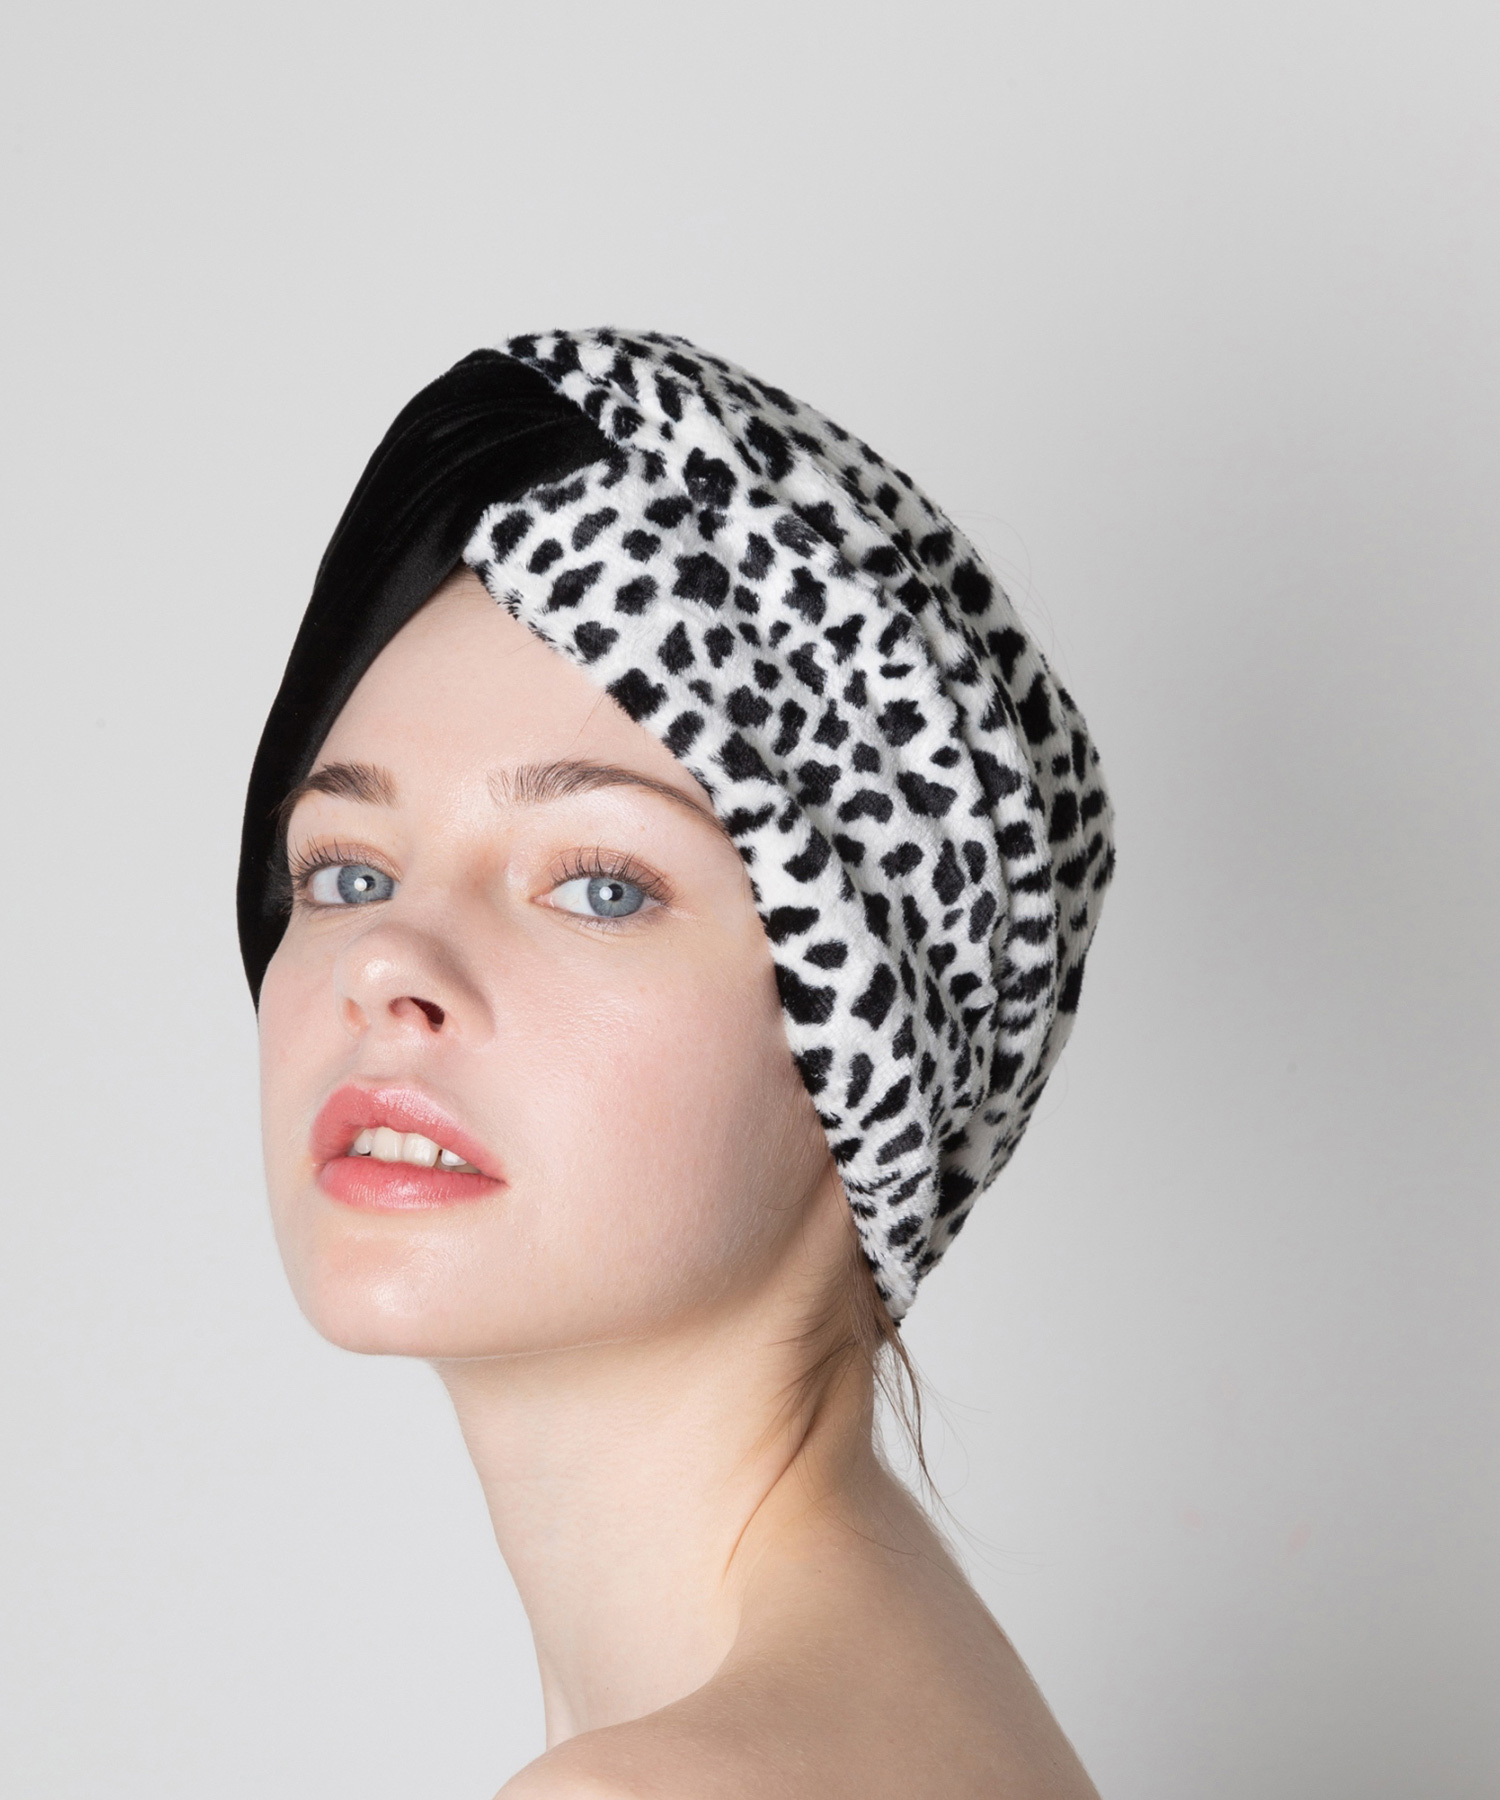 Joe19AW-35 2panel turban (black)